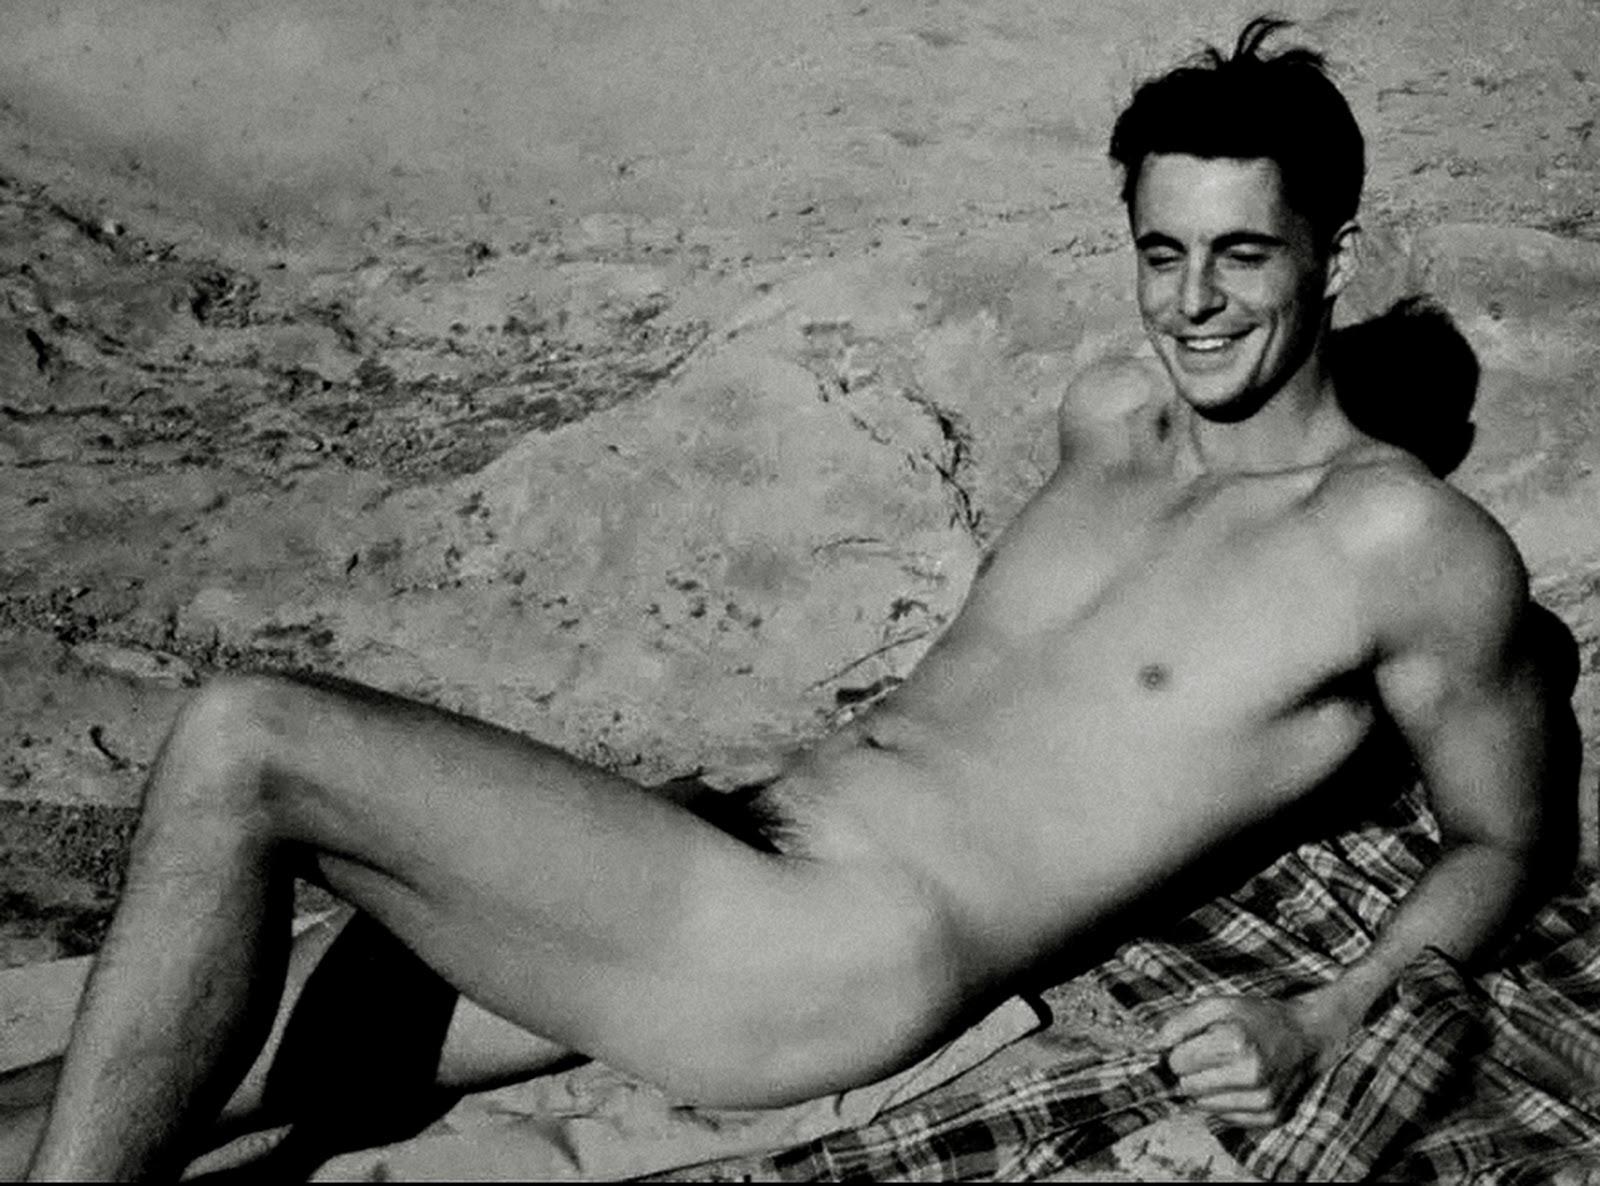 Matthew goode naked body opinion